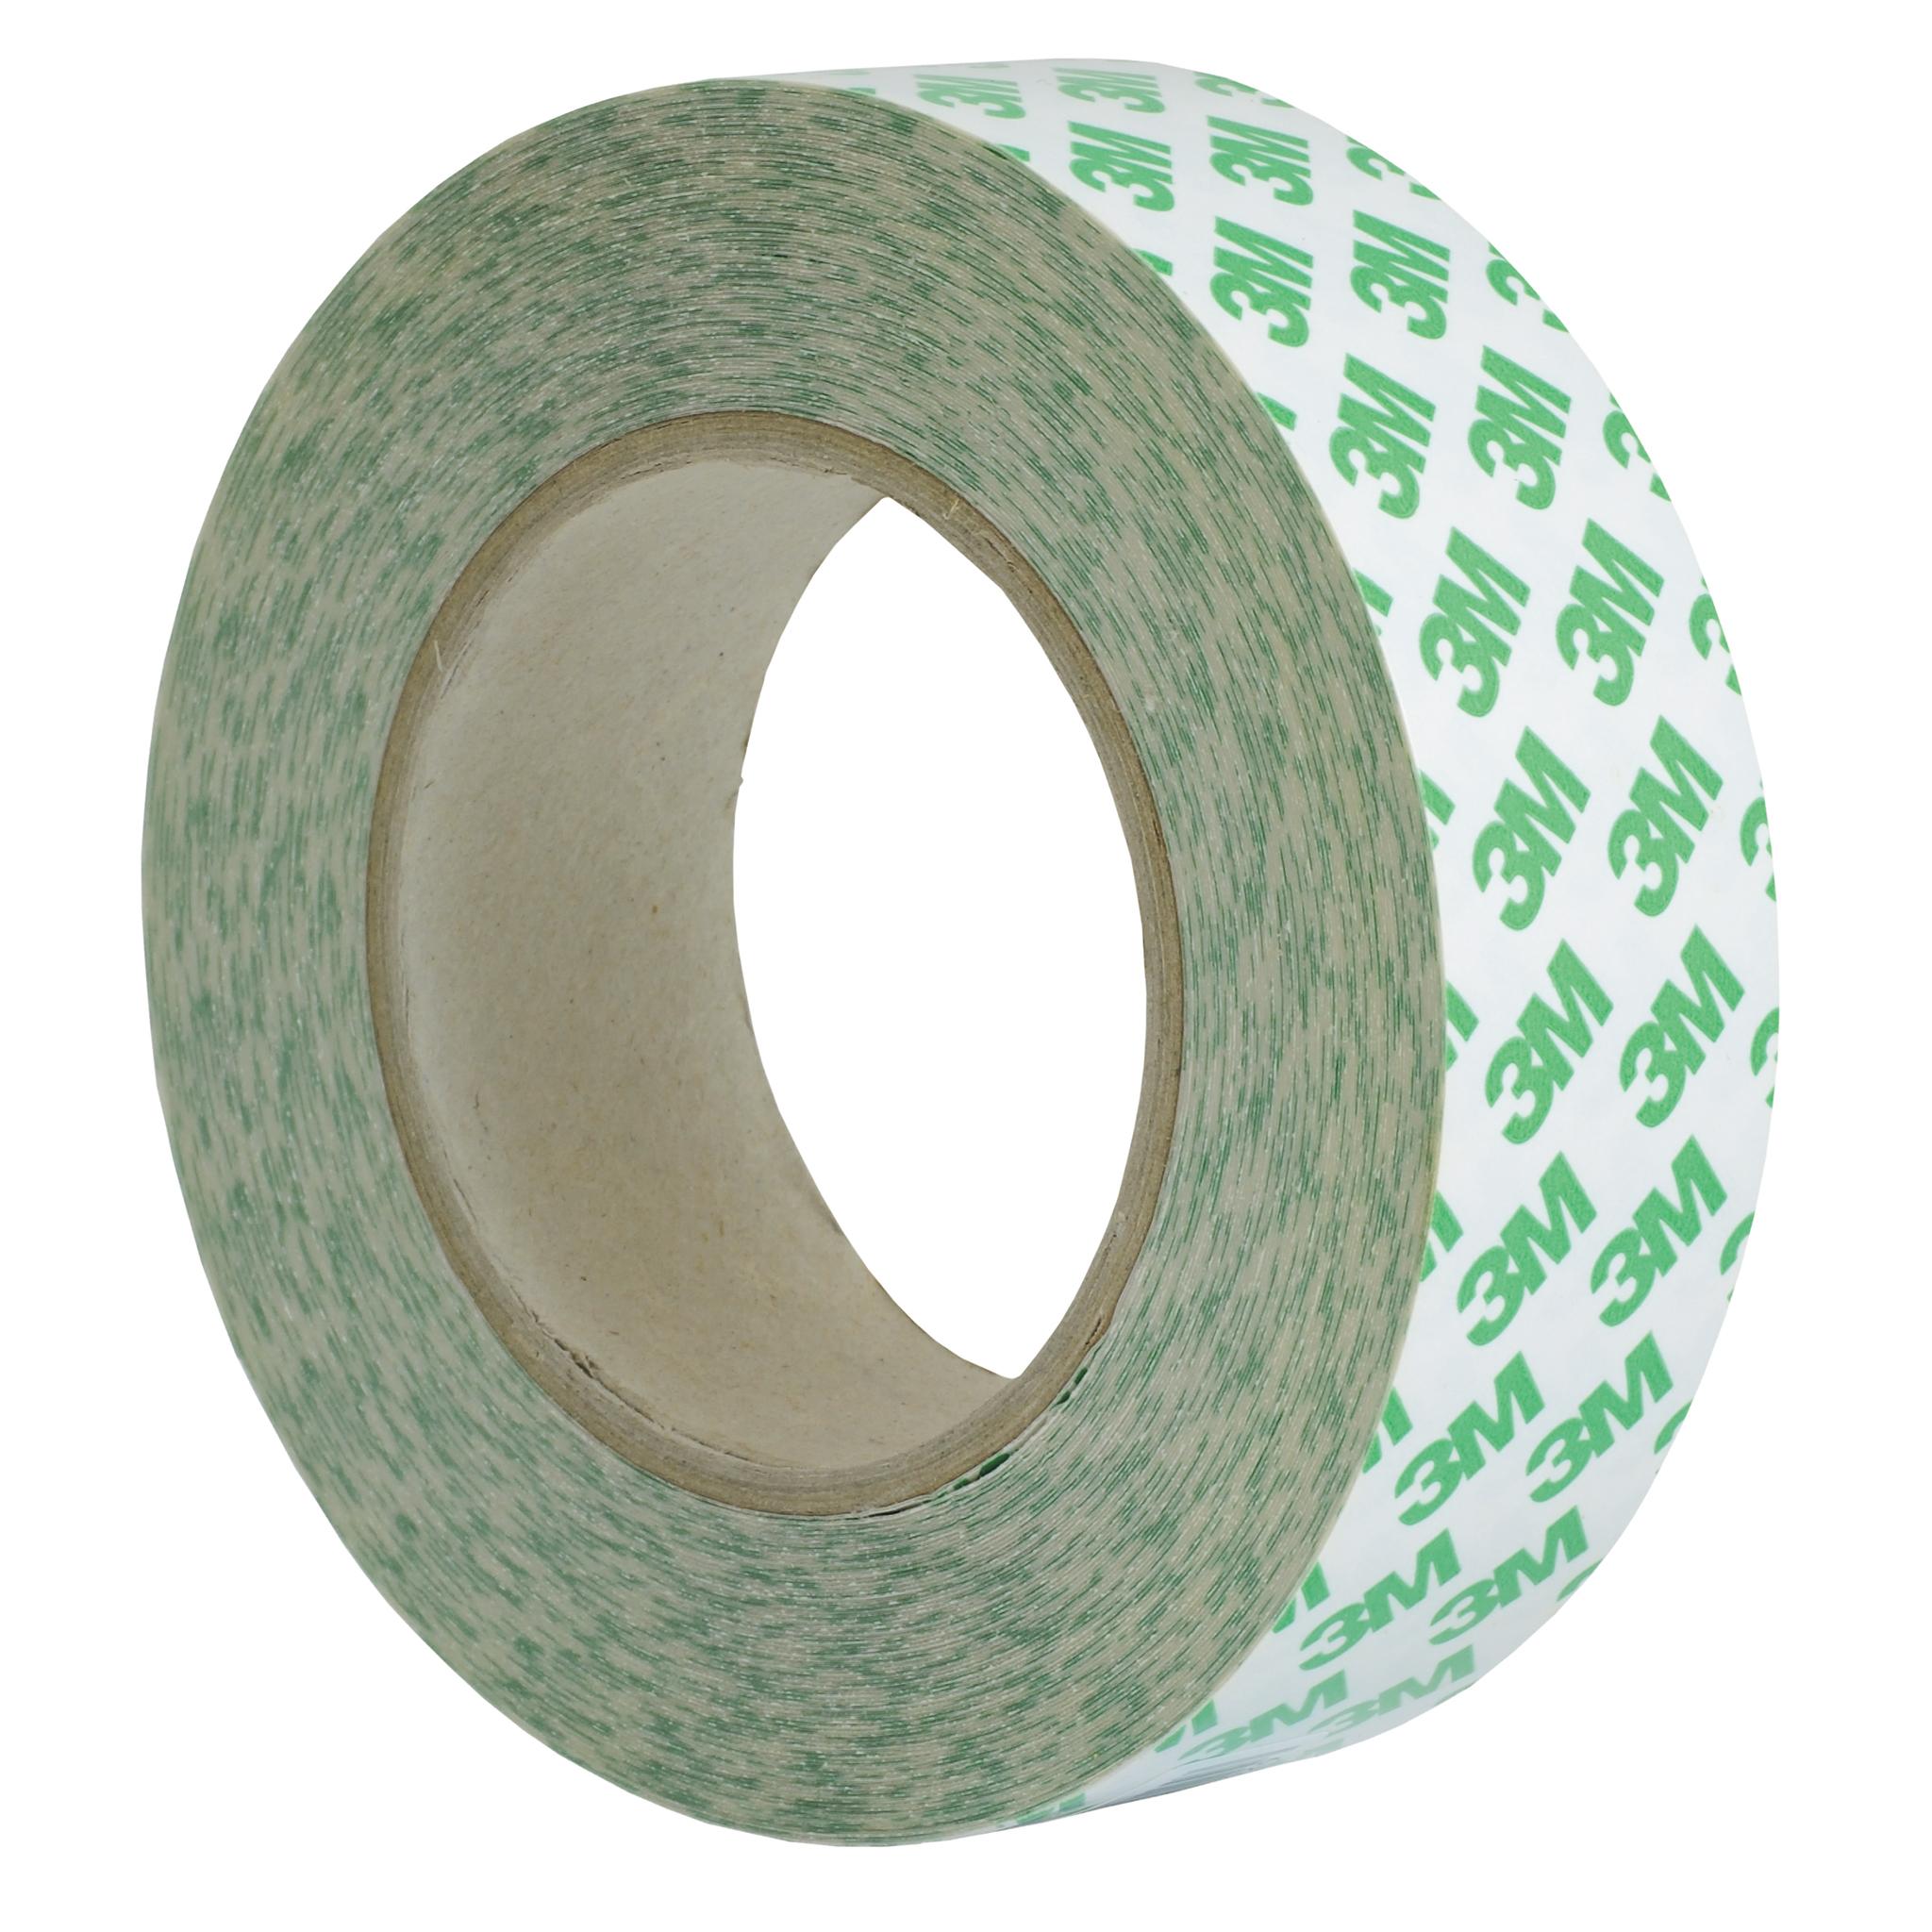 HRANITAPE Adhesive Tape Green 38 x 0,265 mm x 25 m